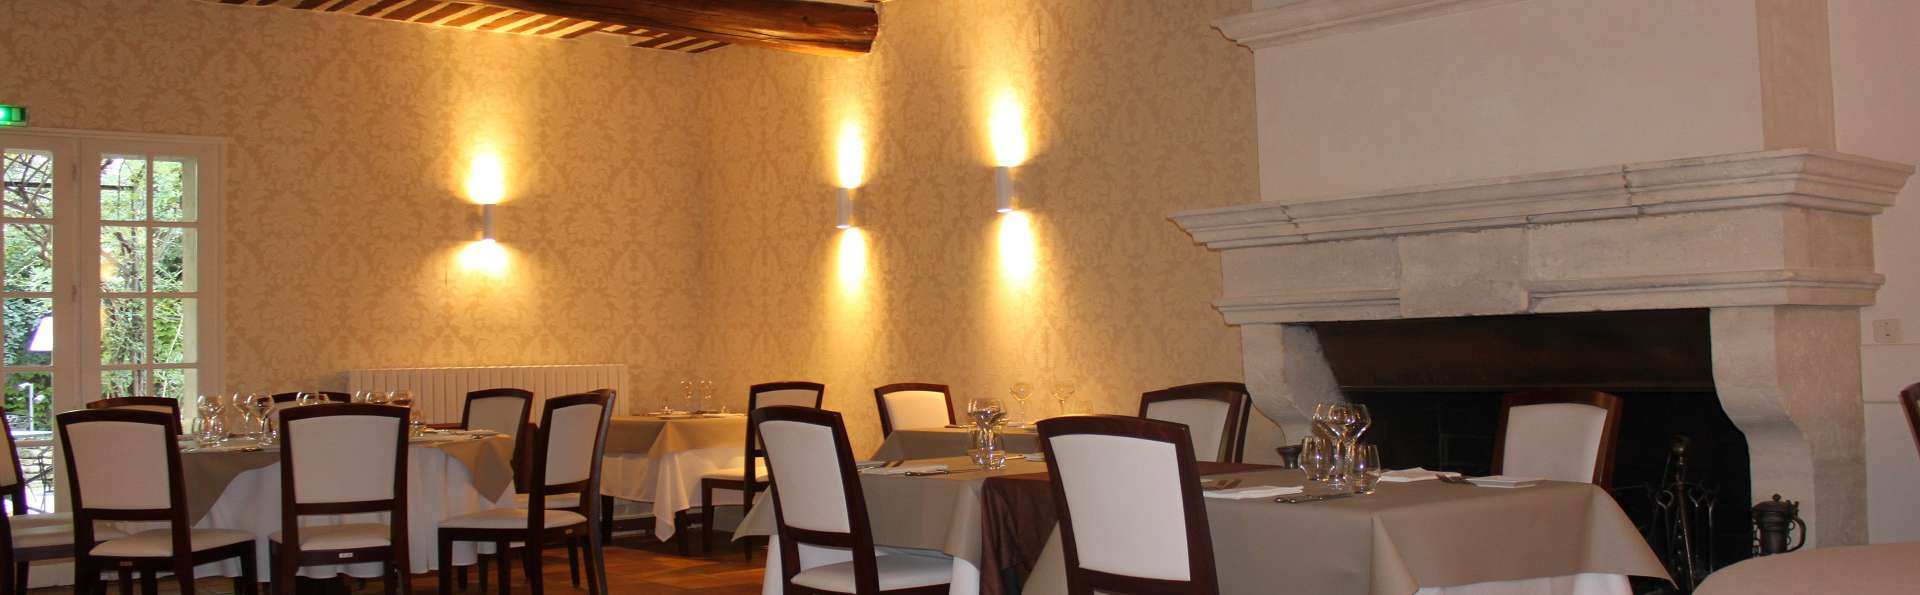 Mas de Cure Bourse - Salle_Restaurant_2.jpg